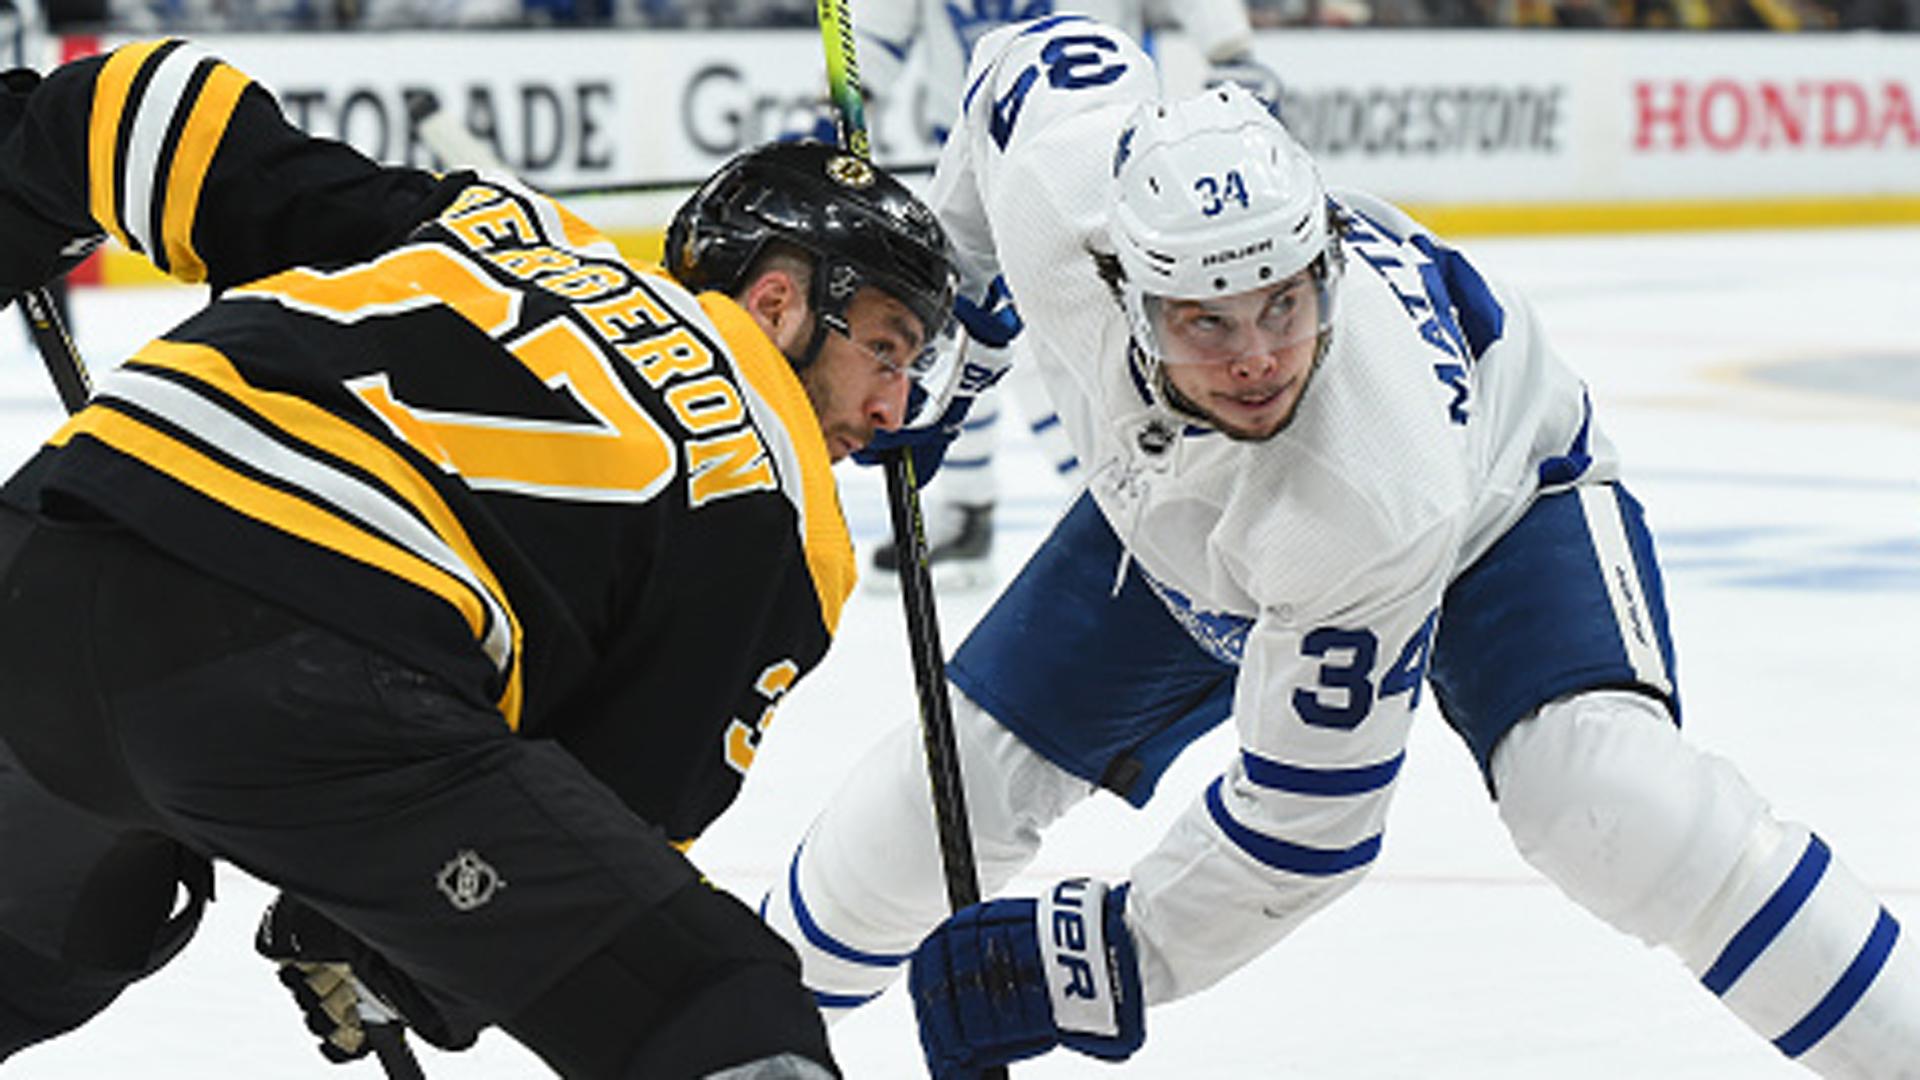 TSN Hockey analysts make their Game 7 predictions